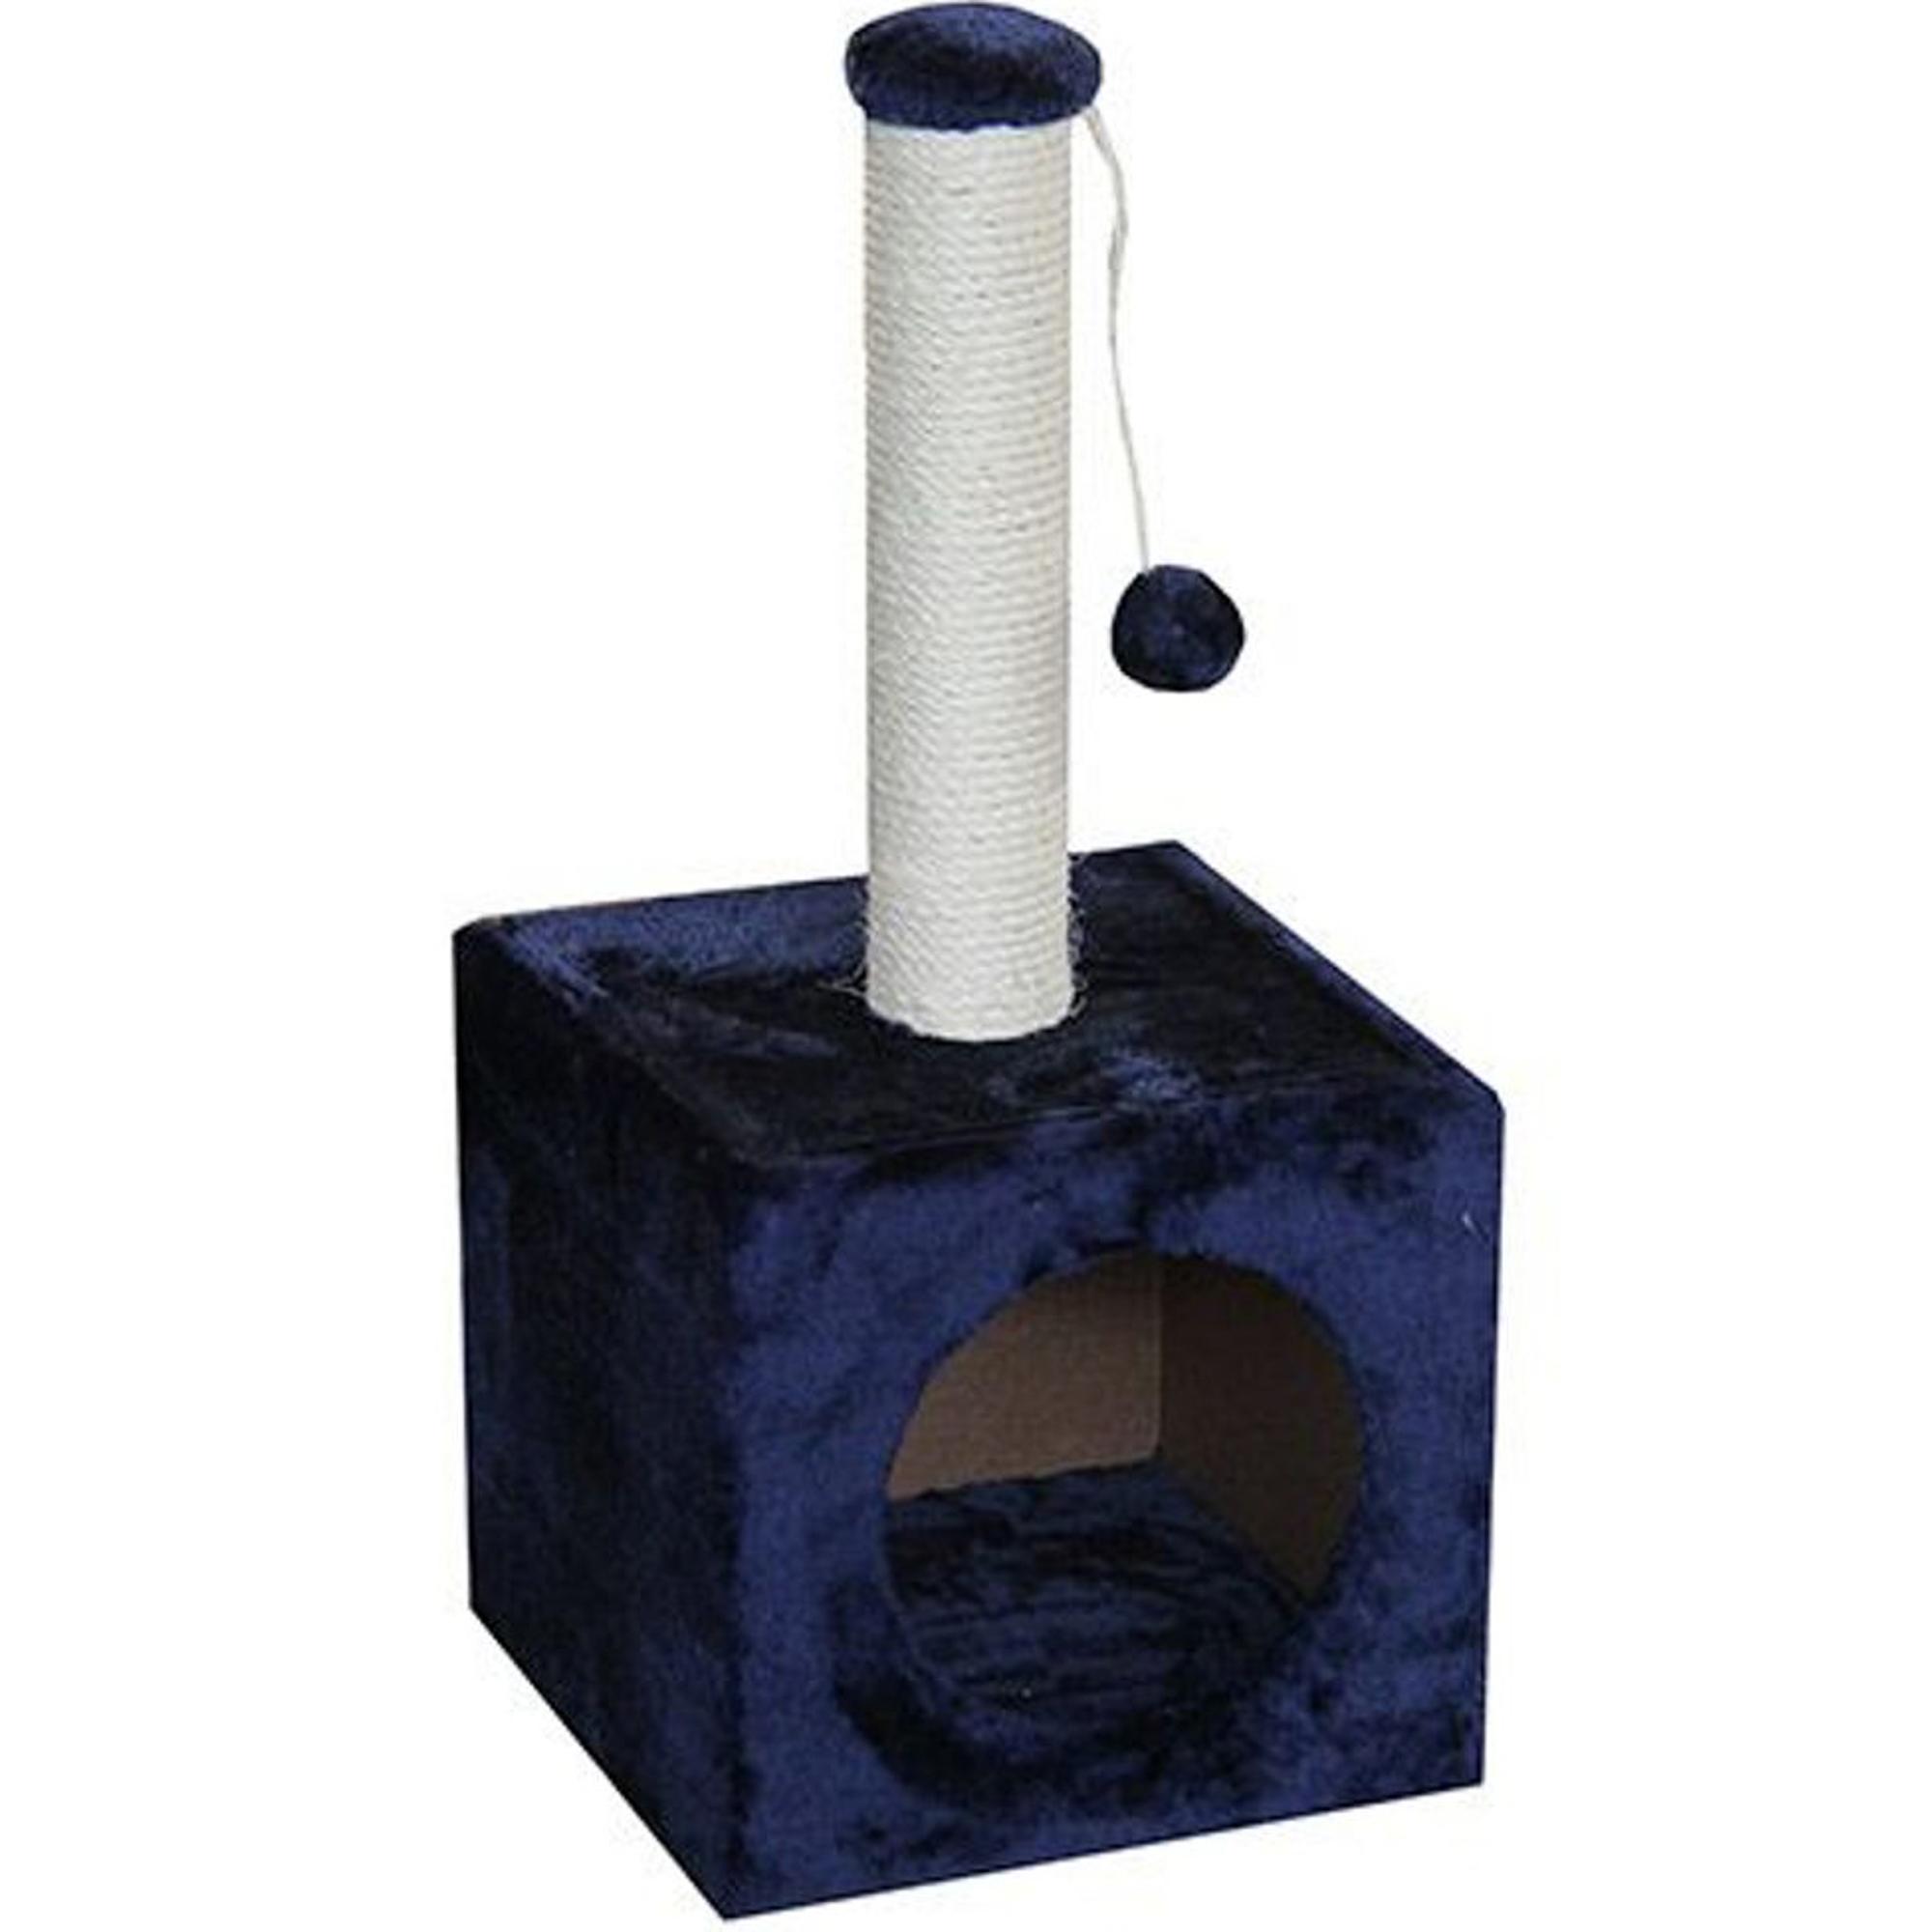 Когтеточка для котят MAJOR Домик с игрушкой 31х31х67см синий.